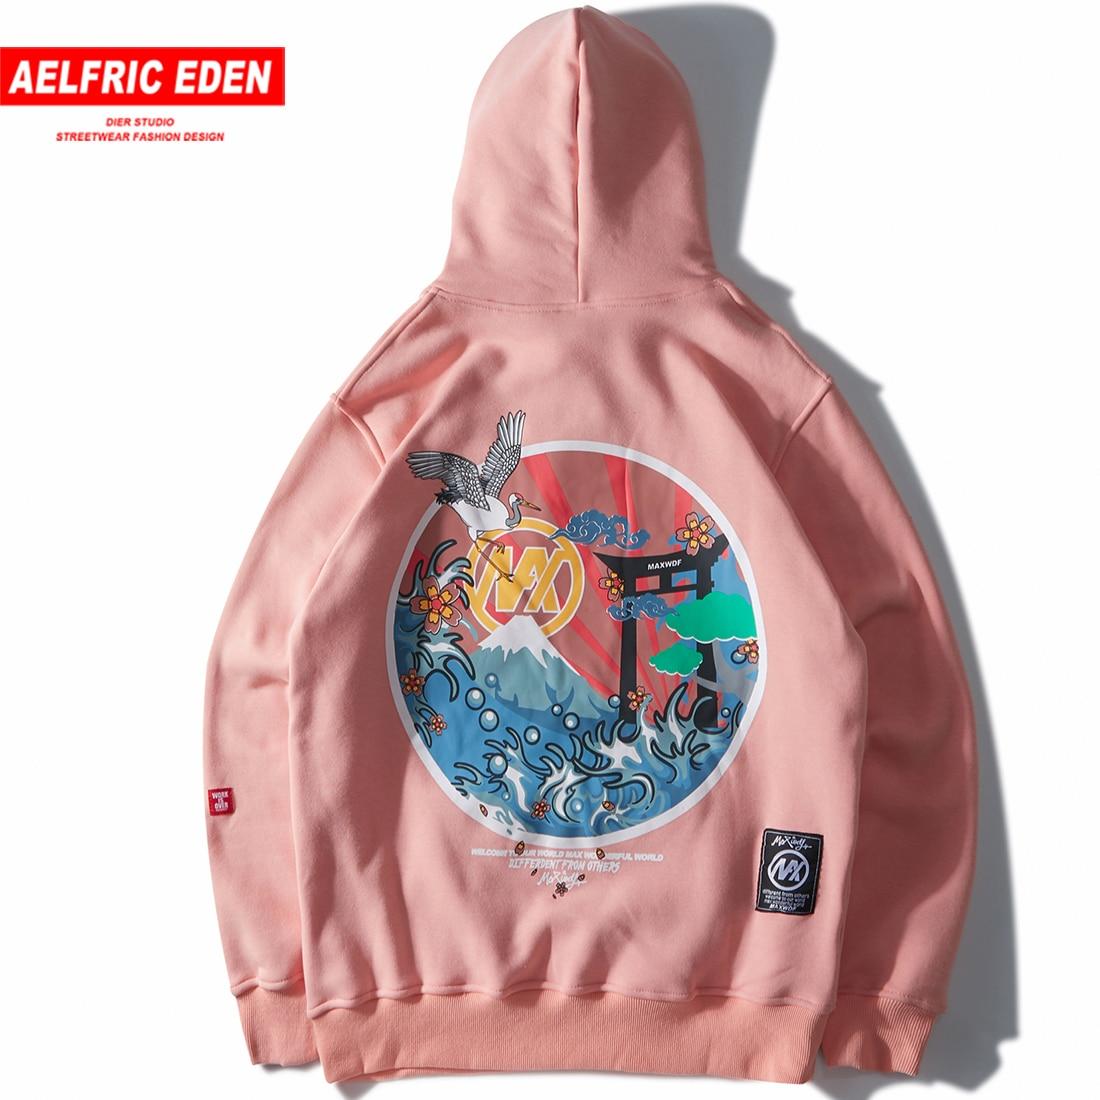 Aelfric Eden Japanischen Bestickt Krane Fleece Hoodies Sweatshirts Streetwear Männer Hip Hop Casual Pullover Winter Hoodie DF06-in Hoodies & Sweatshirts aus Herrenbekleidung bei AliExpress - 11.11_Doppel-11Tag der Singles 1